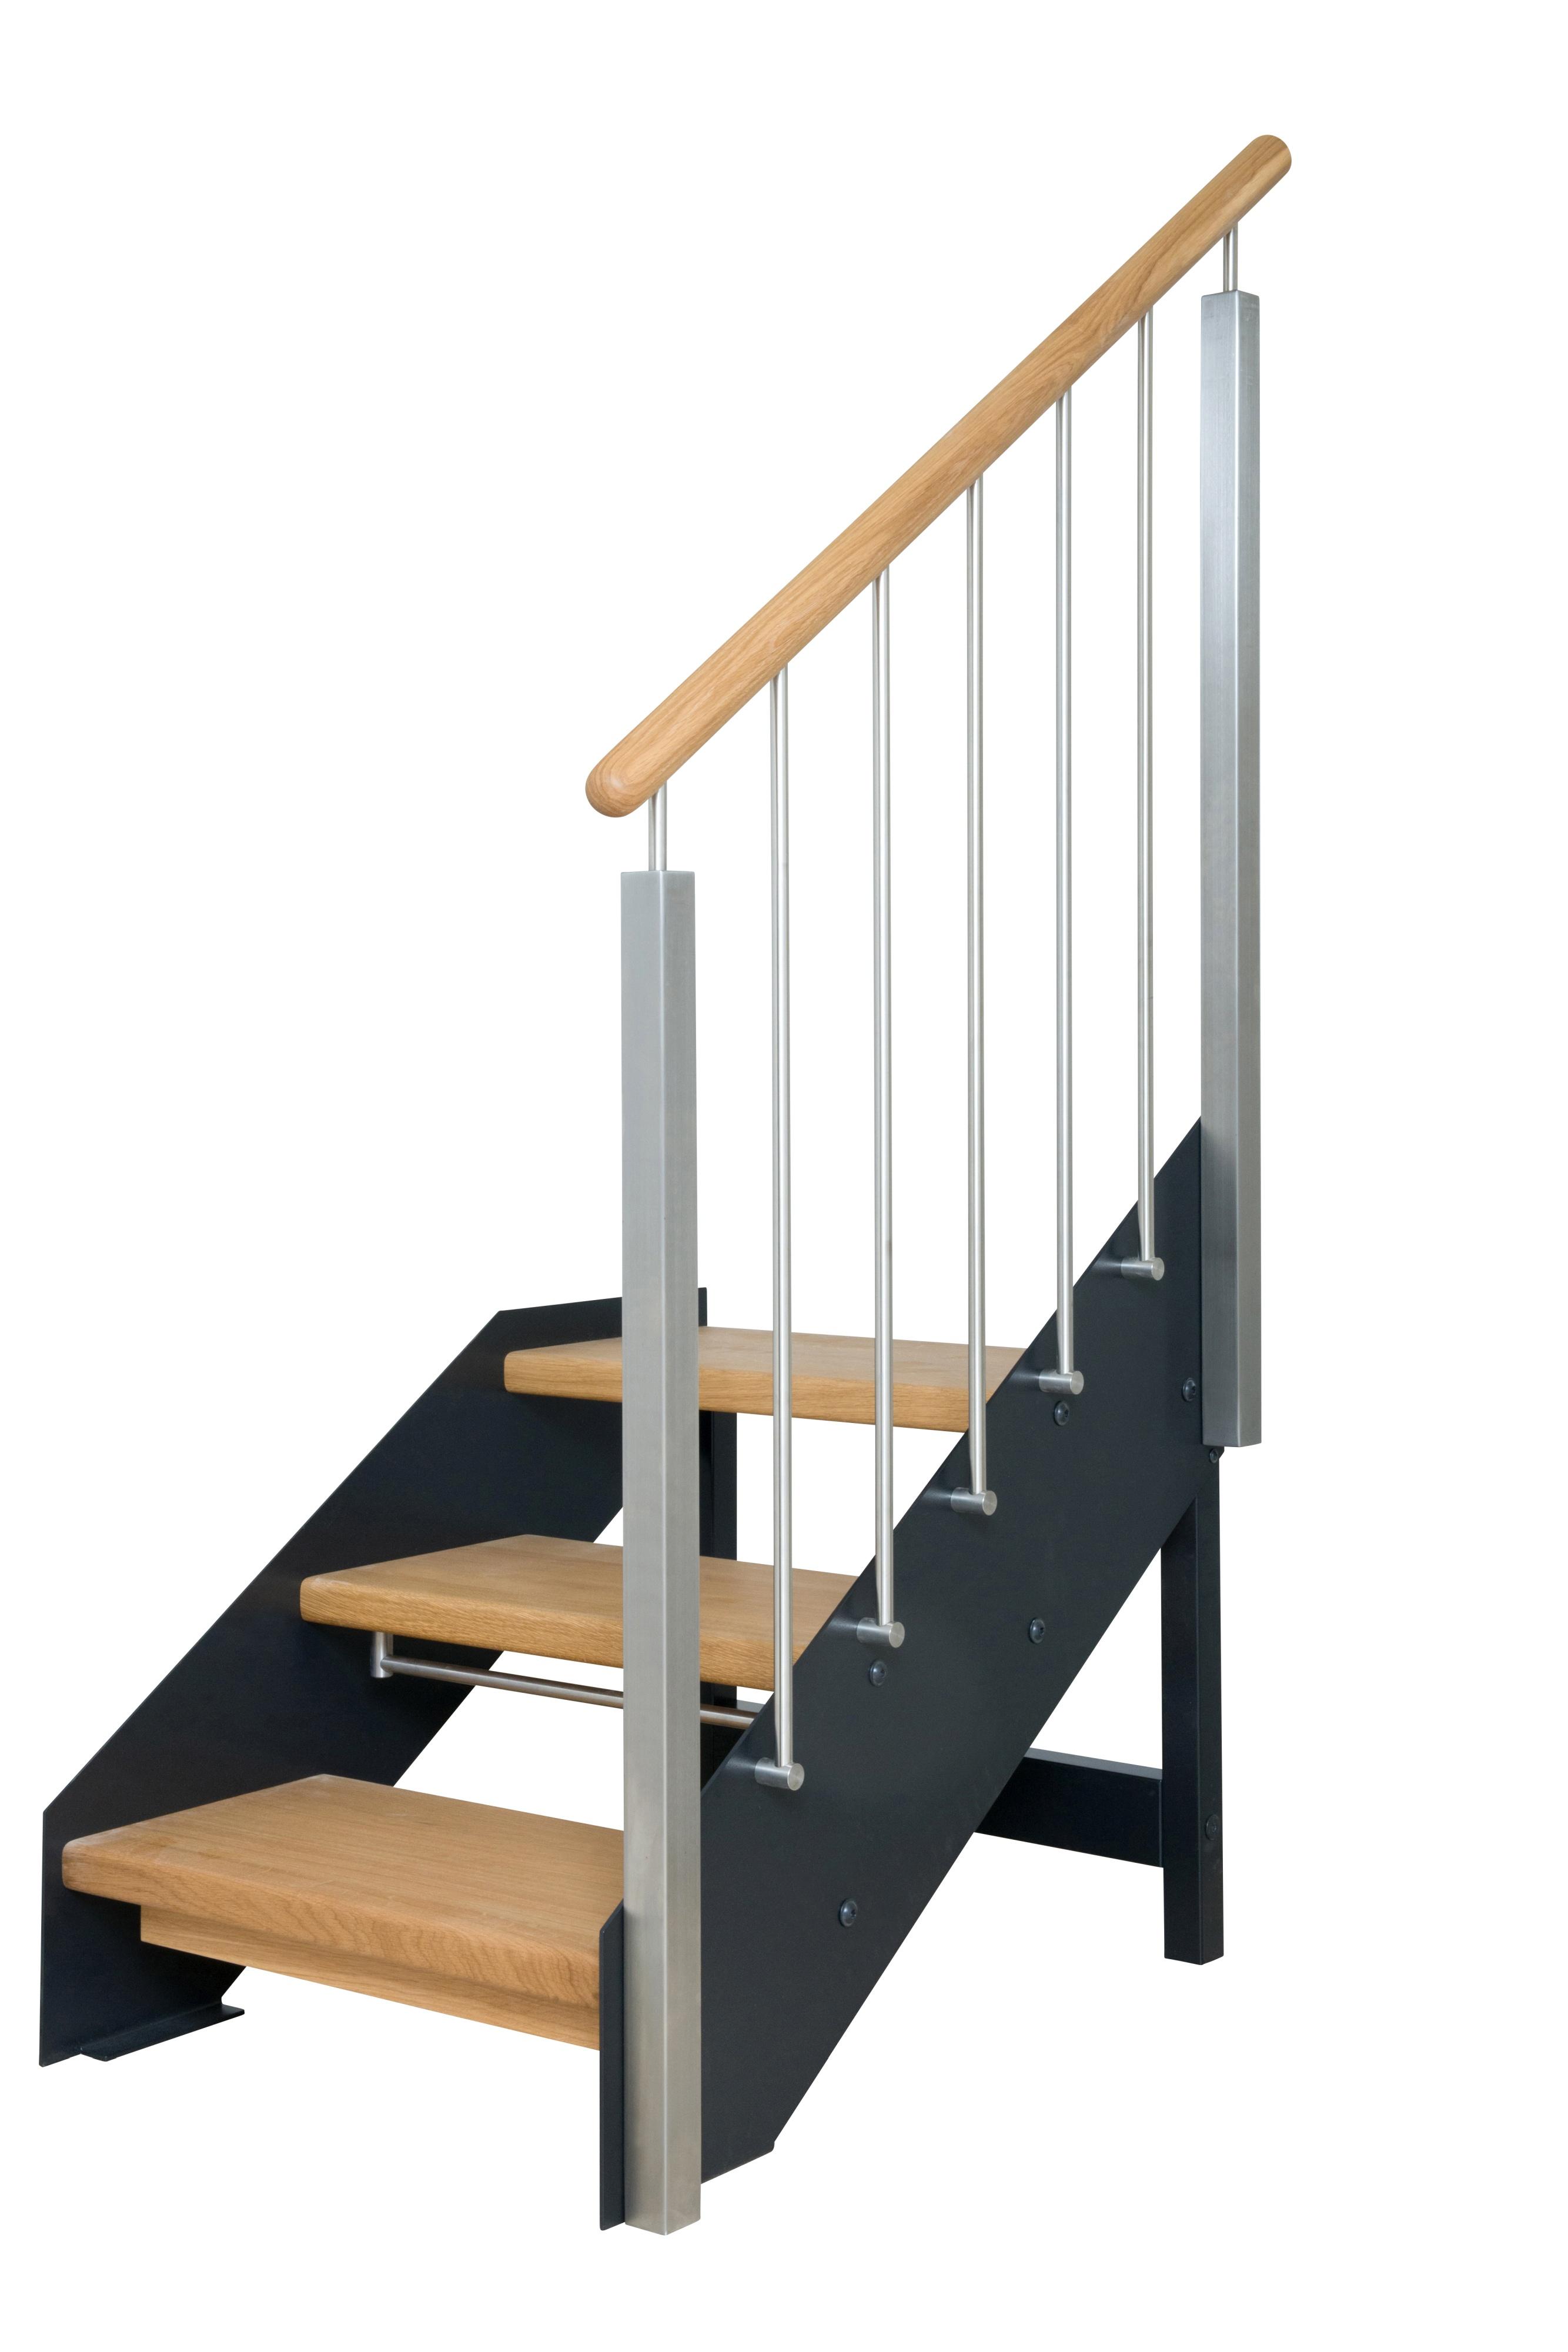 Stair Image 856